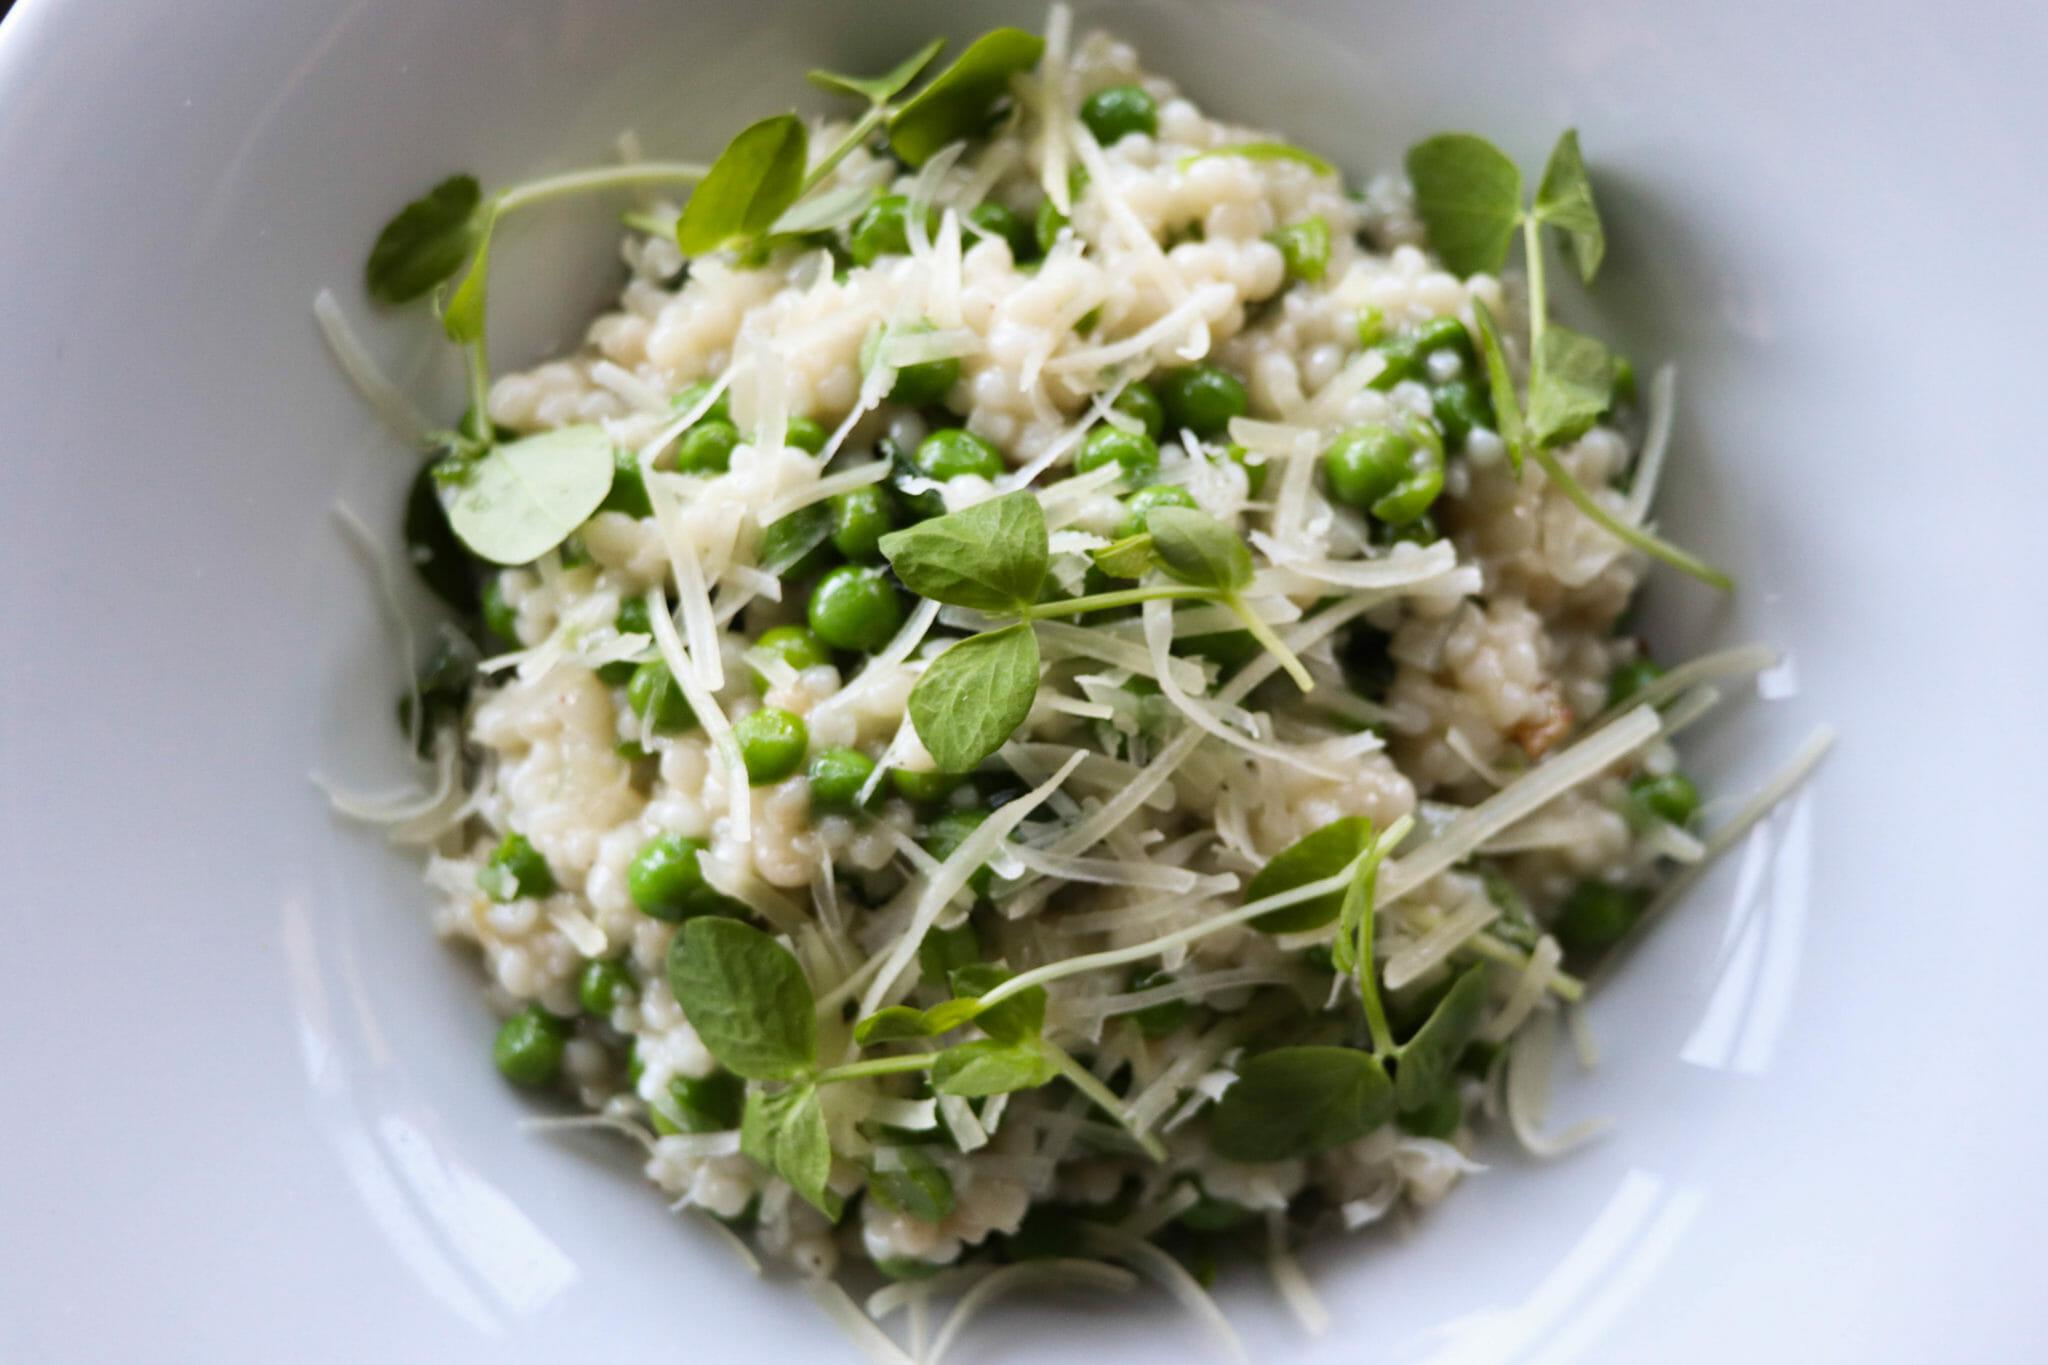 Spring pea and basil pasta in bowl